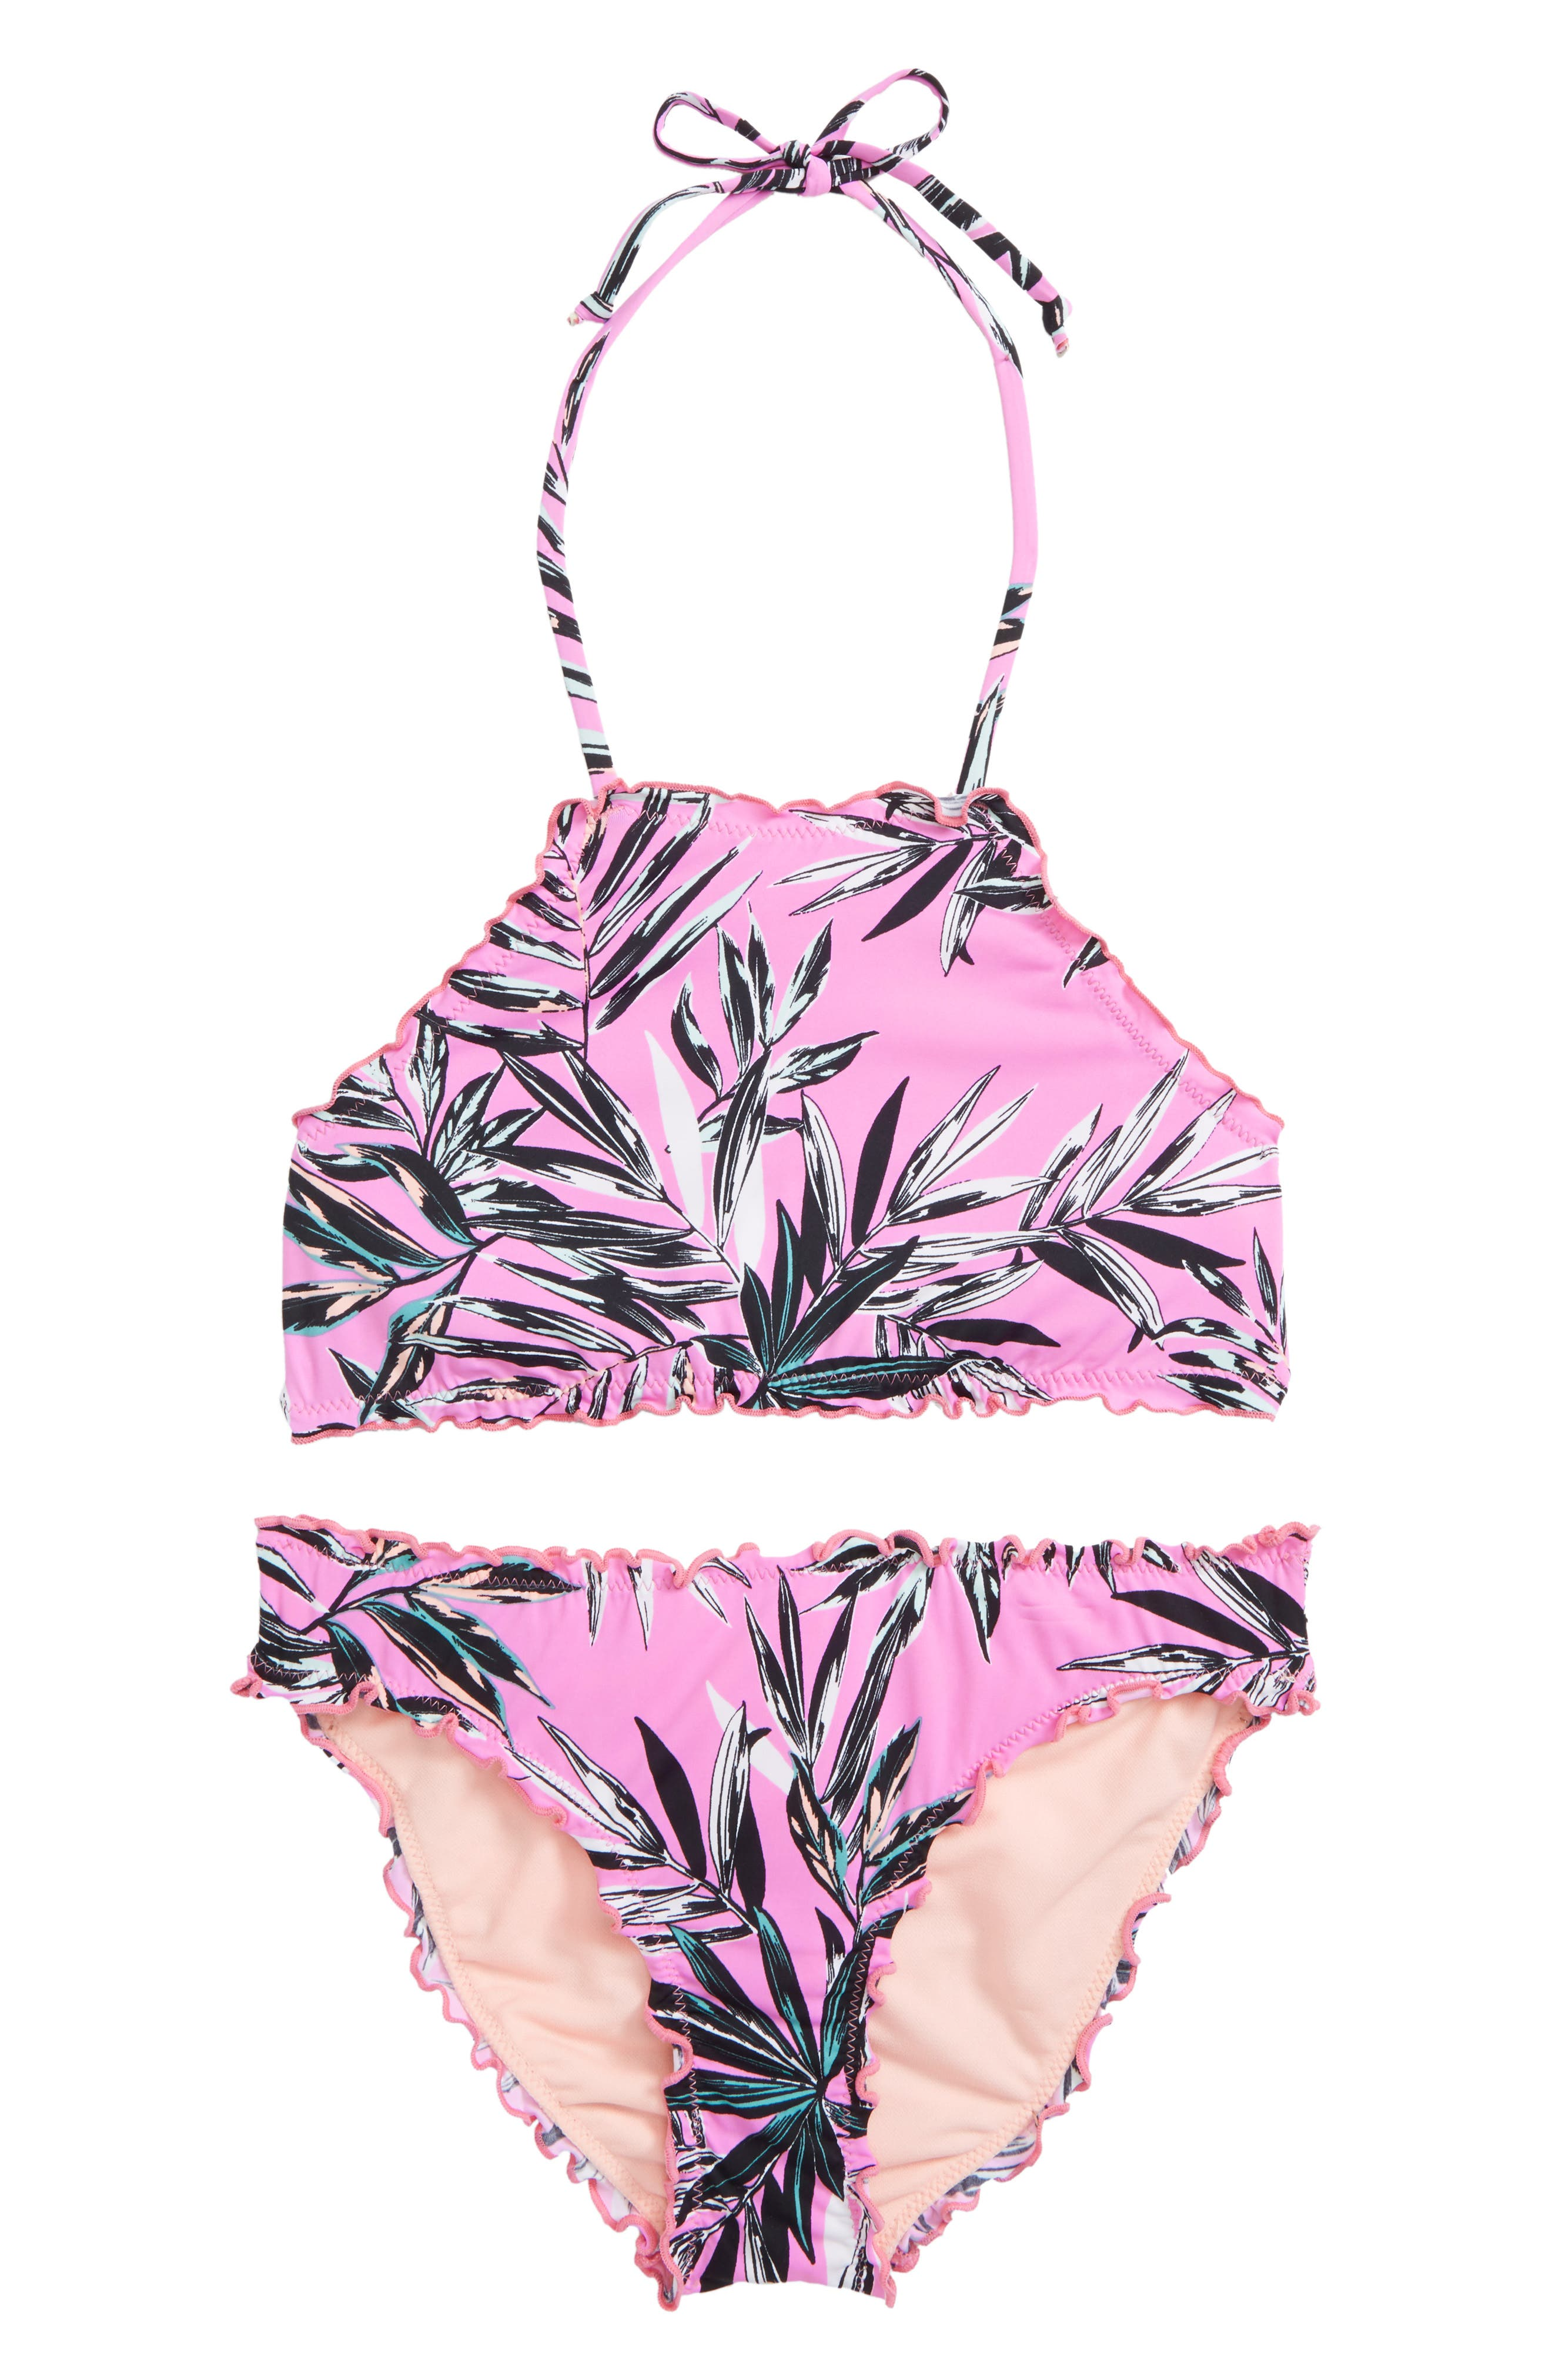 Shara Ruffle Two-Piece Swimsuit,                             Main thumbnail 1, color,                             Fuchsia